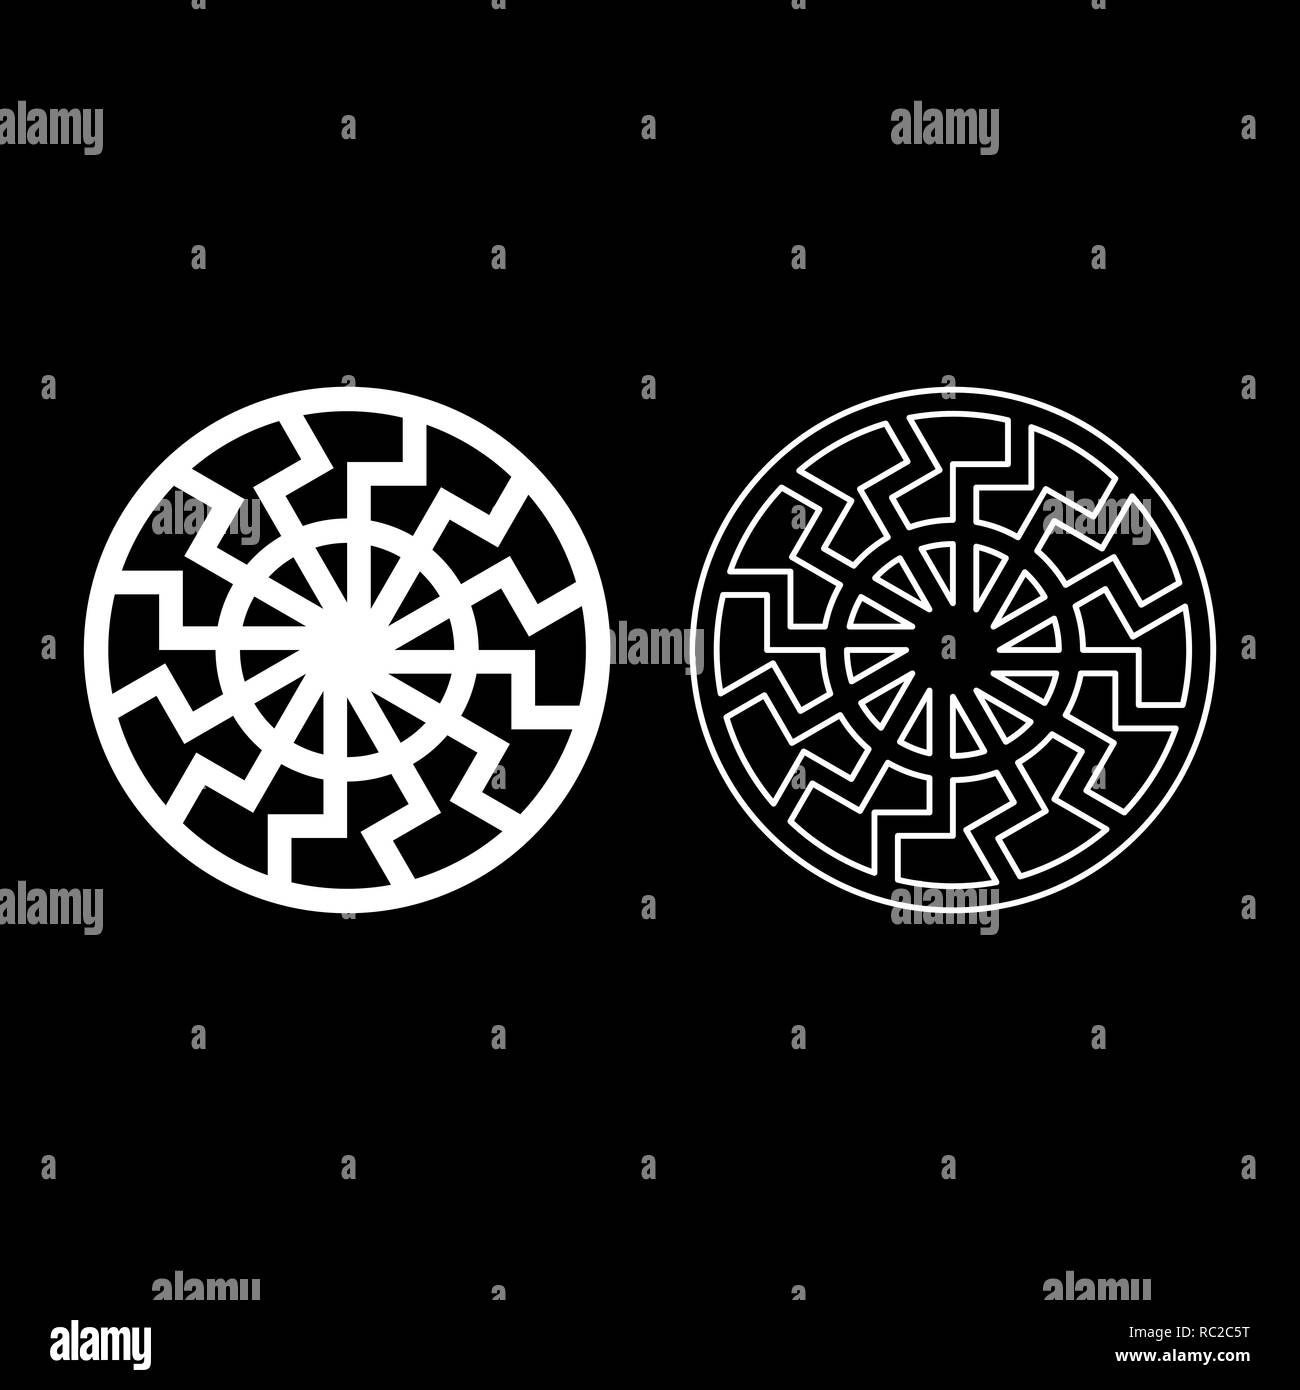 set white sun symbol icon set white color I flat outline style simple image - Stock Image